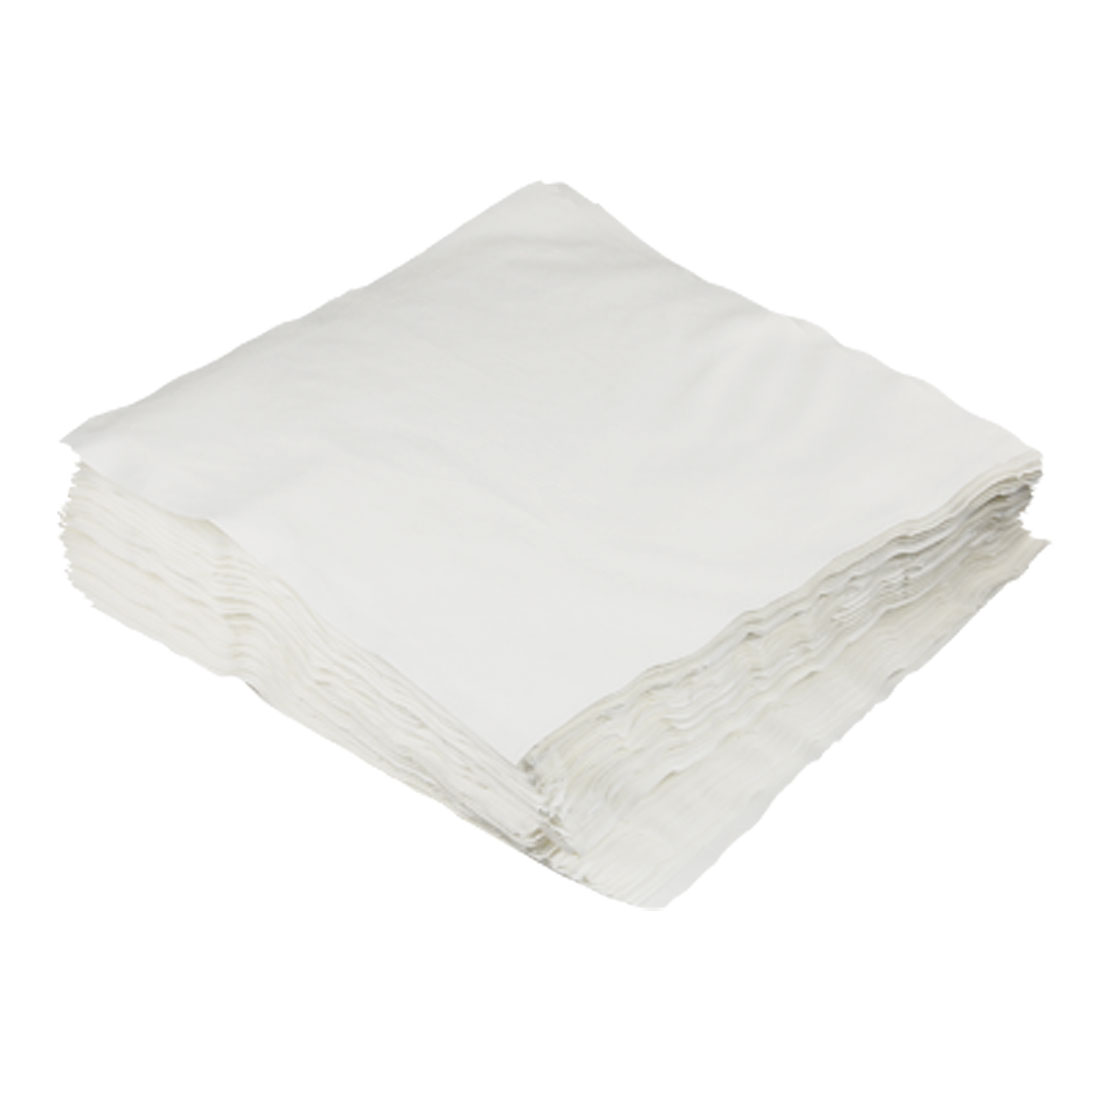 "LCD PCB 9"" x 9"" Clean Room Wiper Wiping Cloth 100 Pcs"